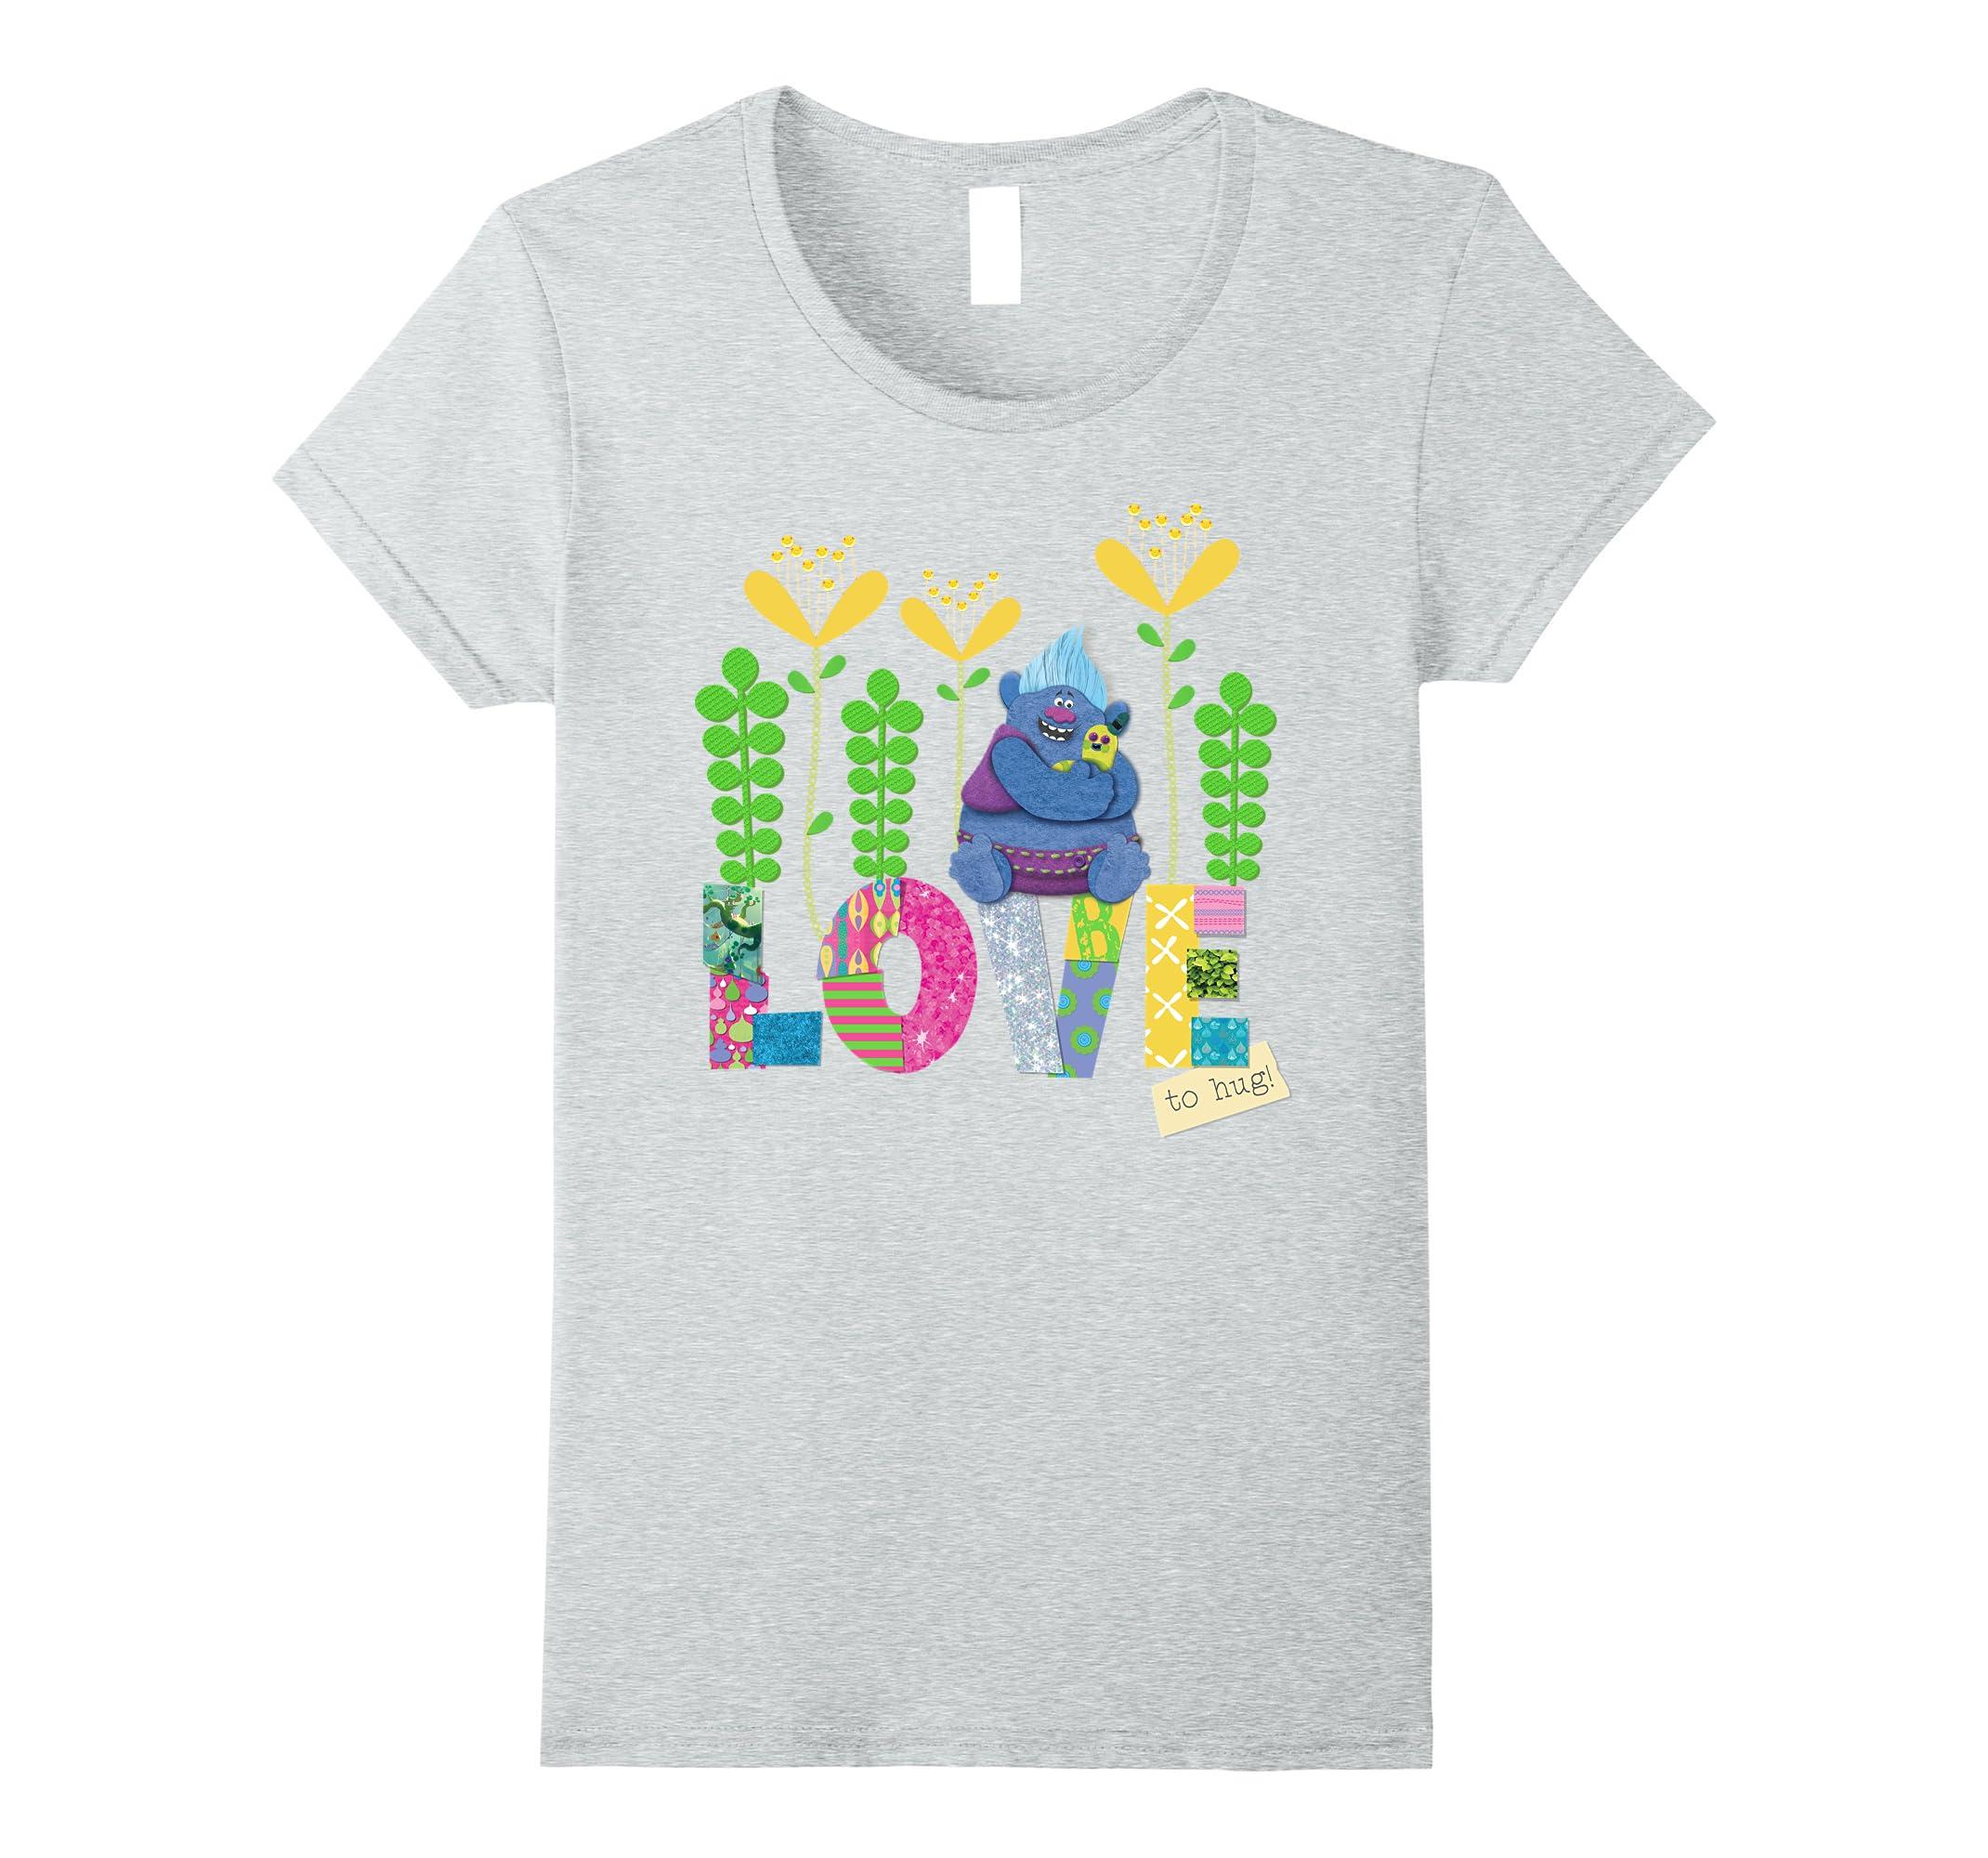 4326602f7047 Amazon.com: DreamWorks' Trolls Love to Hug Biggie T-Shirt: Clothing